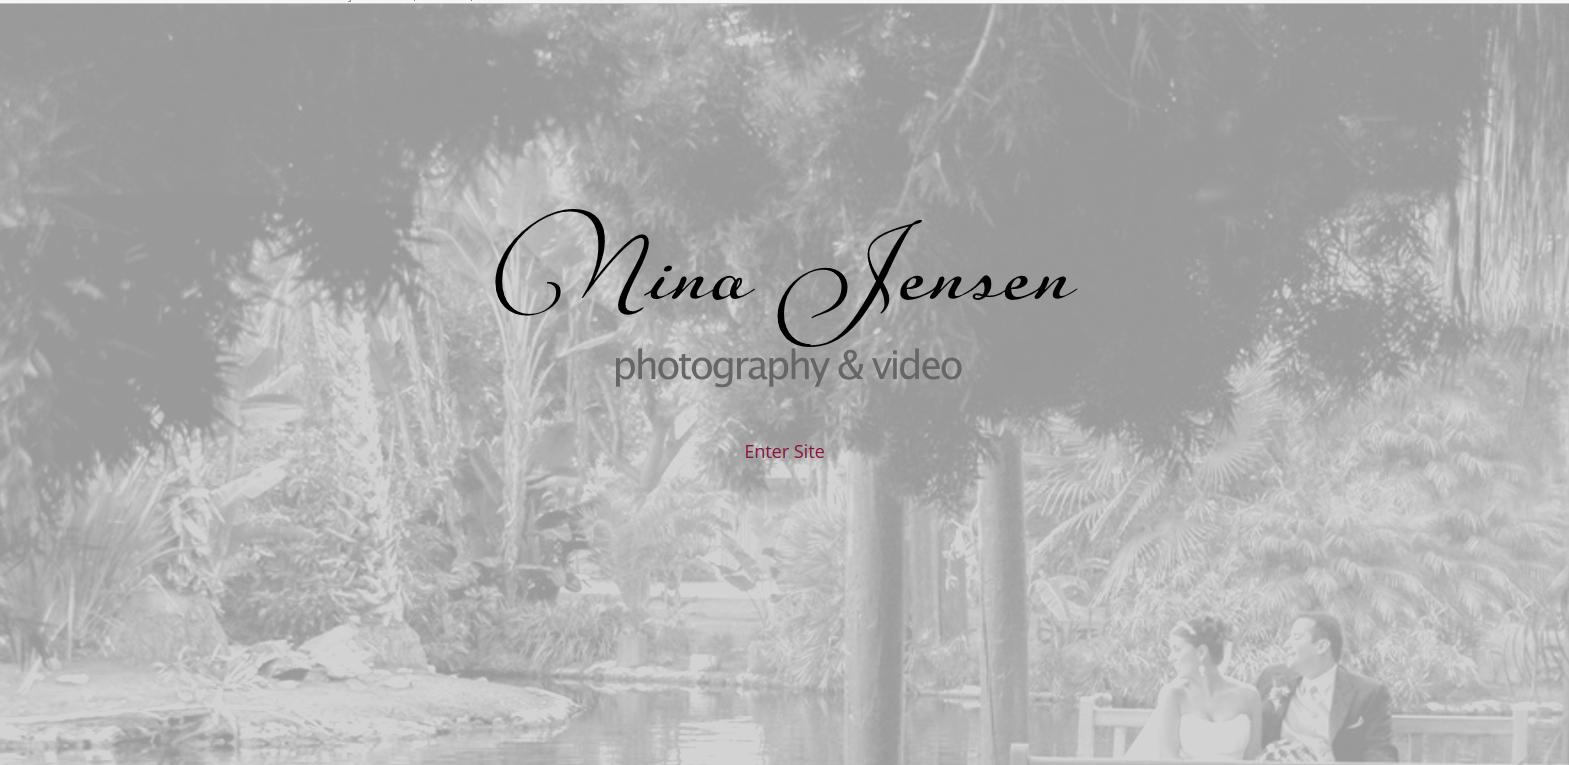 Nina Jensen Photographer